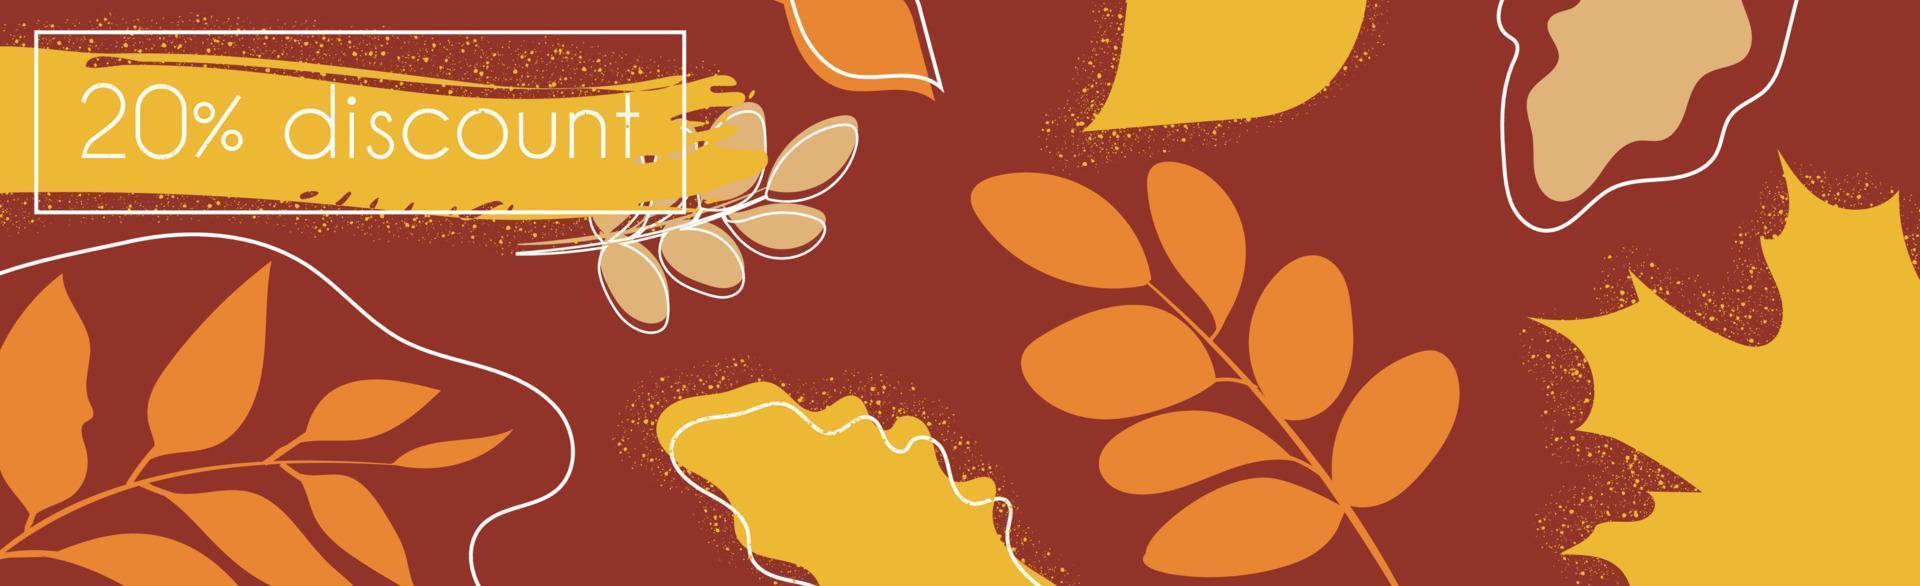 20 por cento de grandes descontos de outono, banner de anúncio da web - vetor